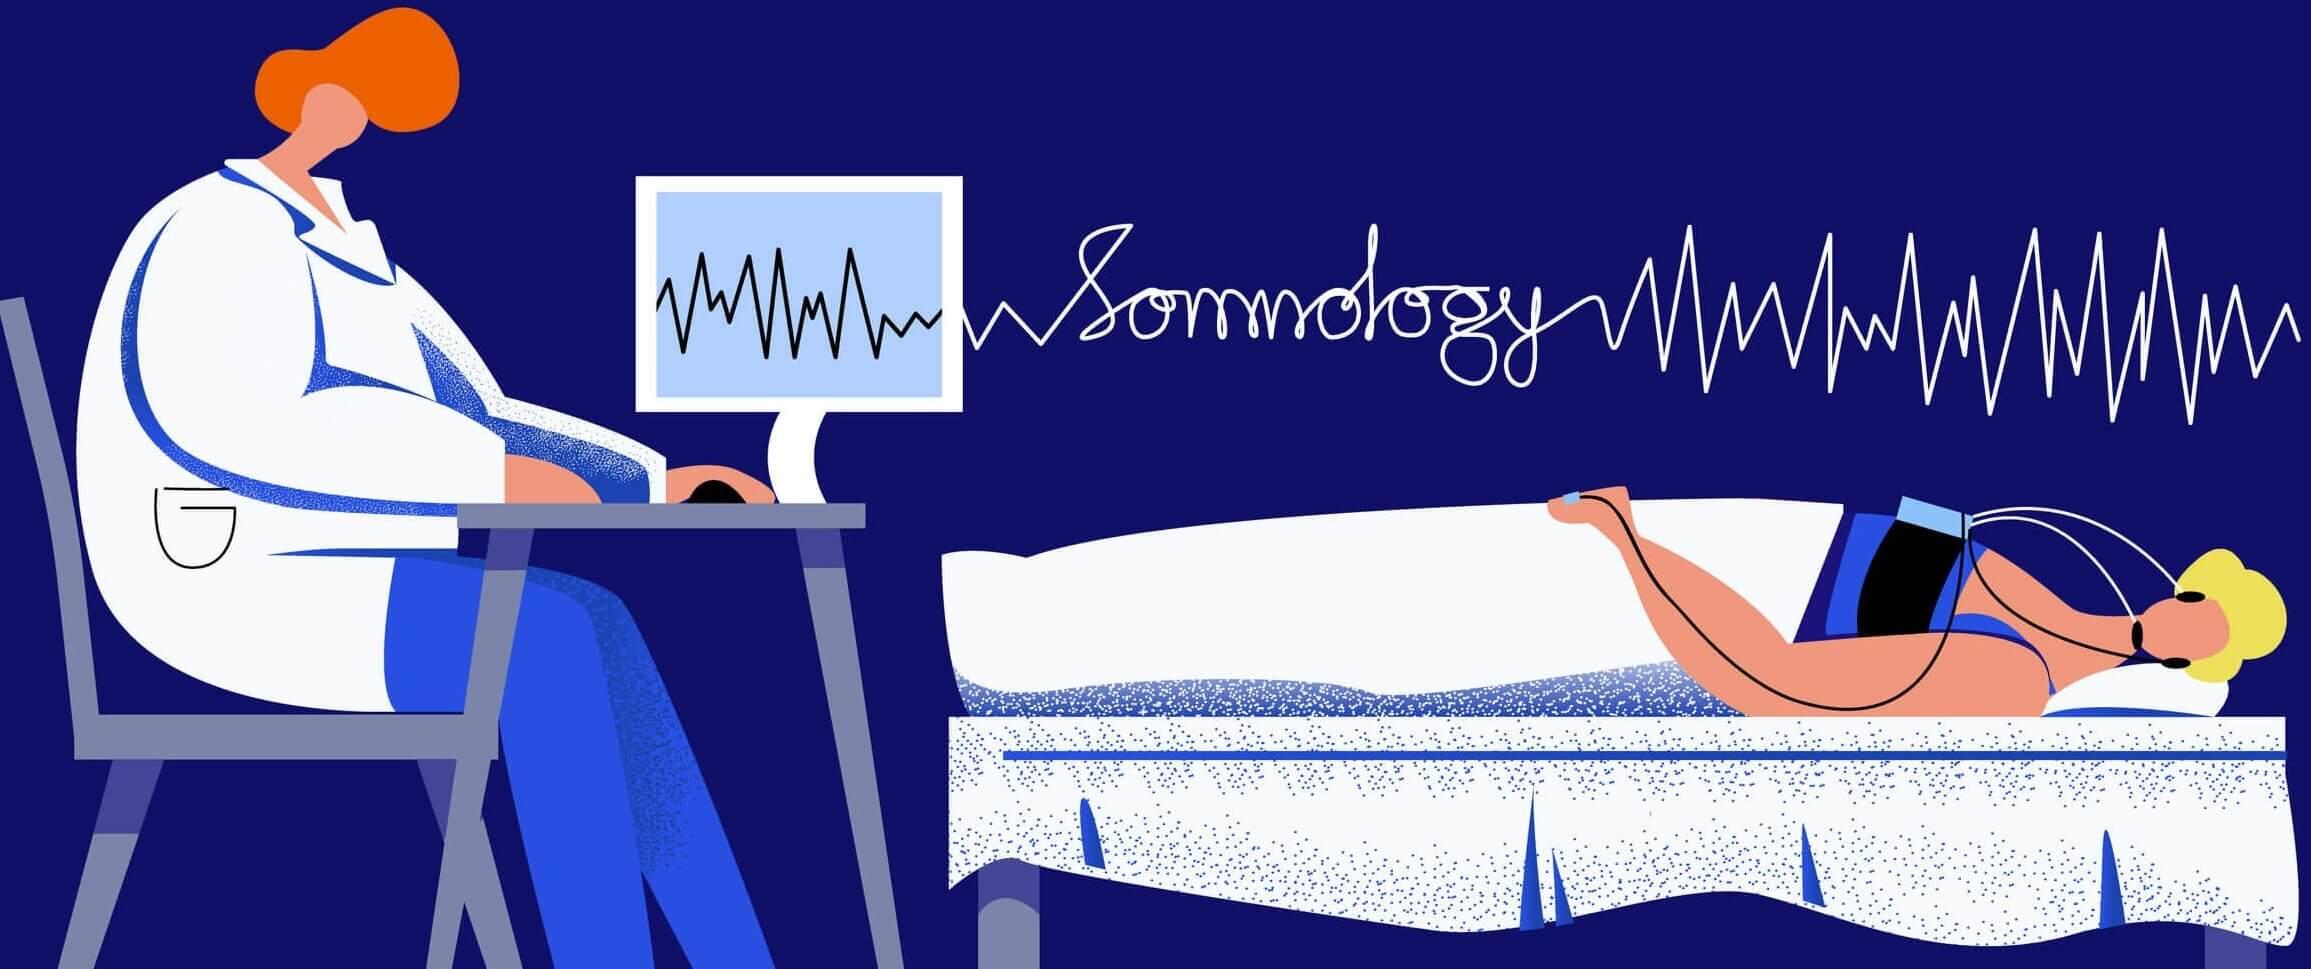 睡眠時無呼吸症候群の診断にはPSG検査-横浜市港北区の大倉山耳鼻科